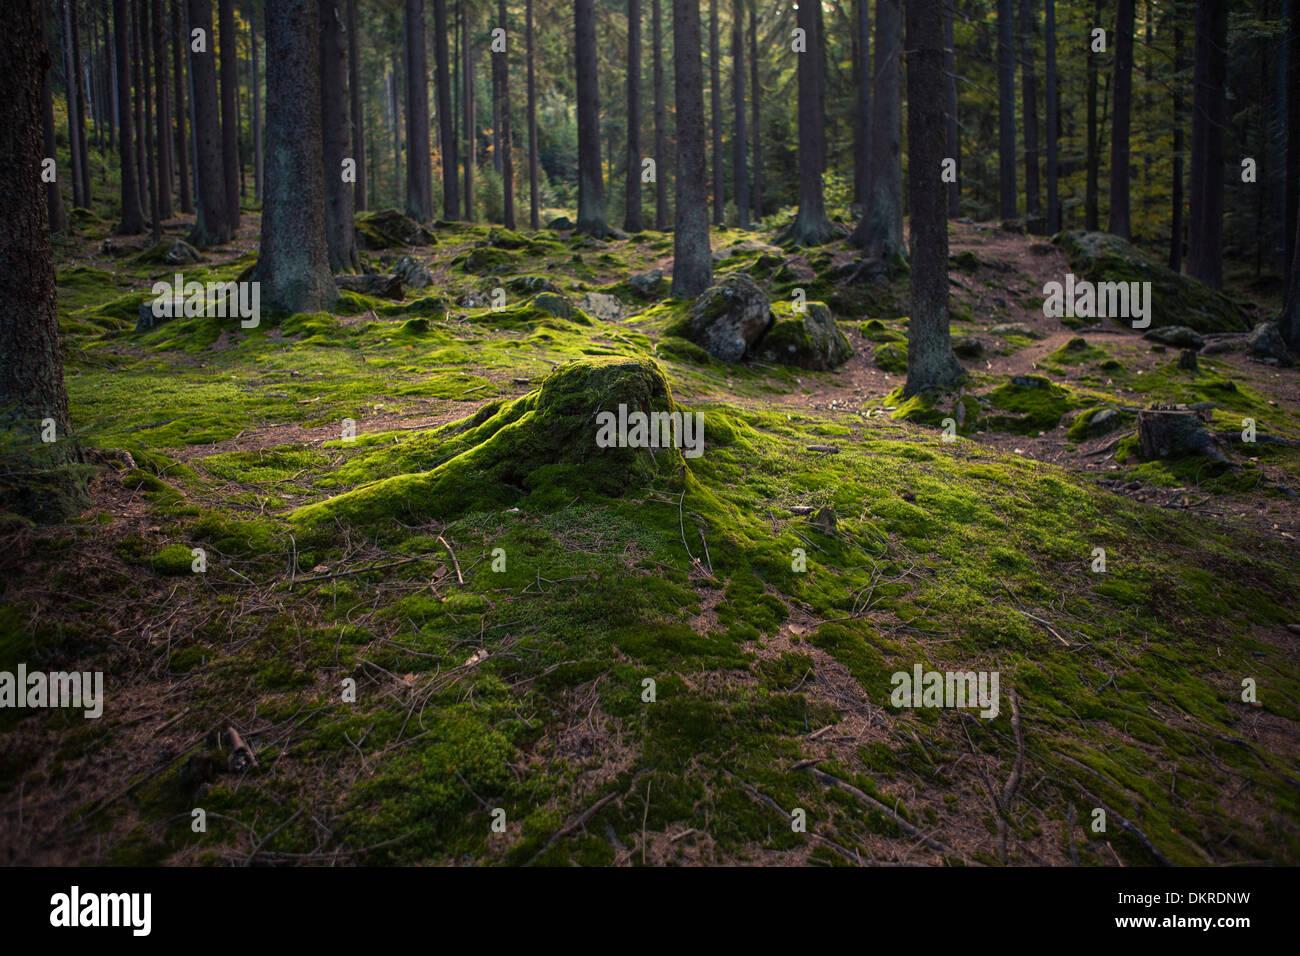 Mossy tree stump, Bavarian Forest, Bavaria, Germany - Stock Image